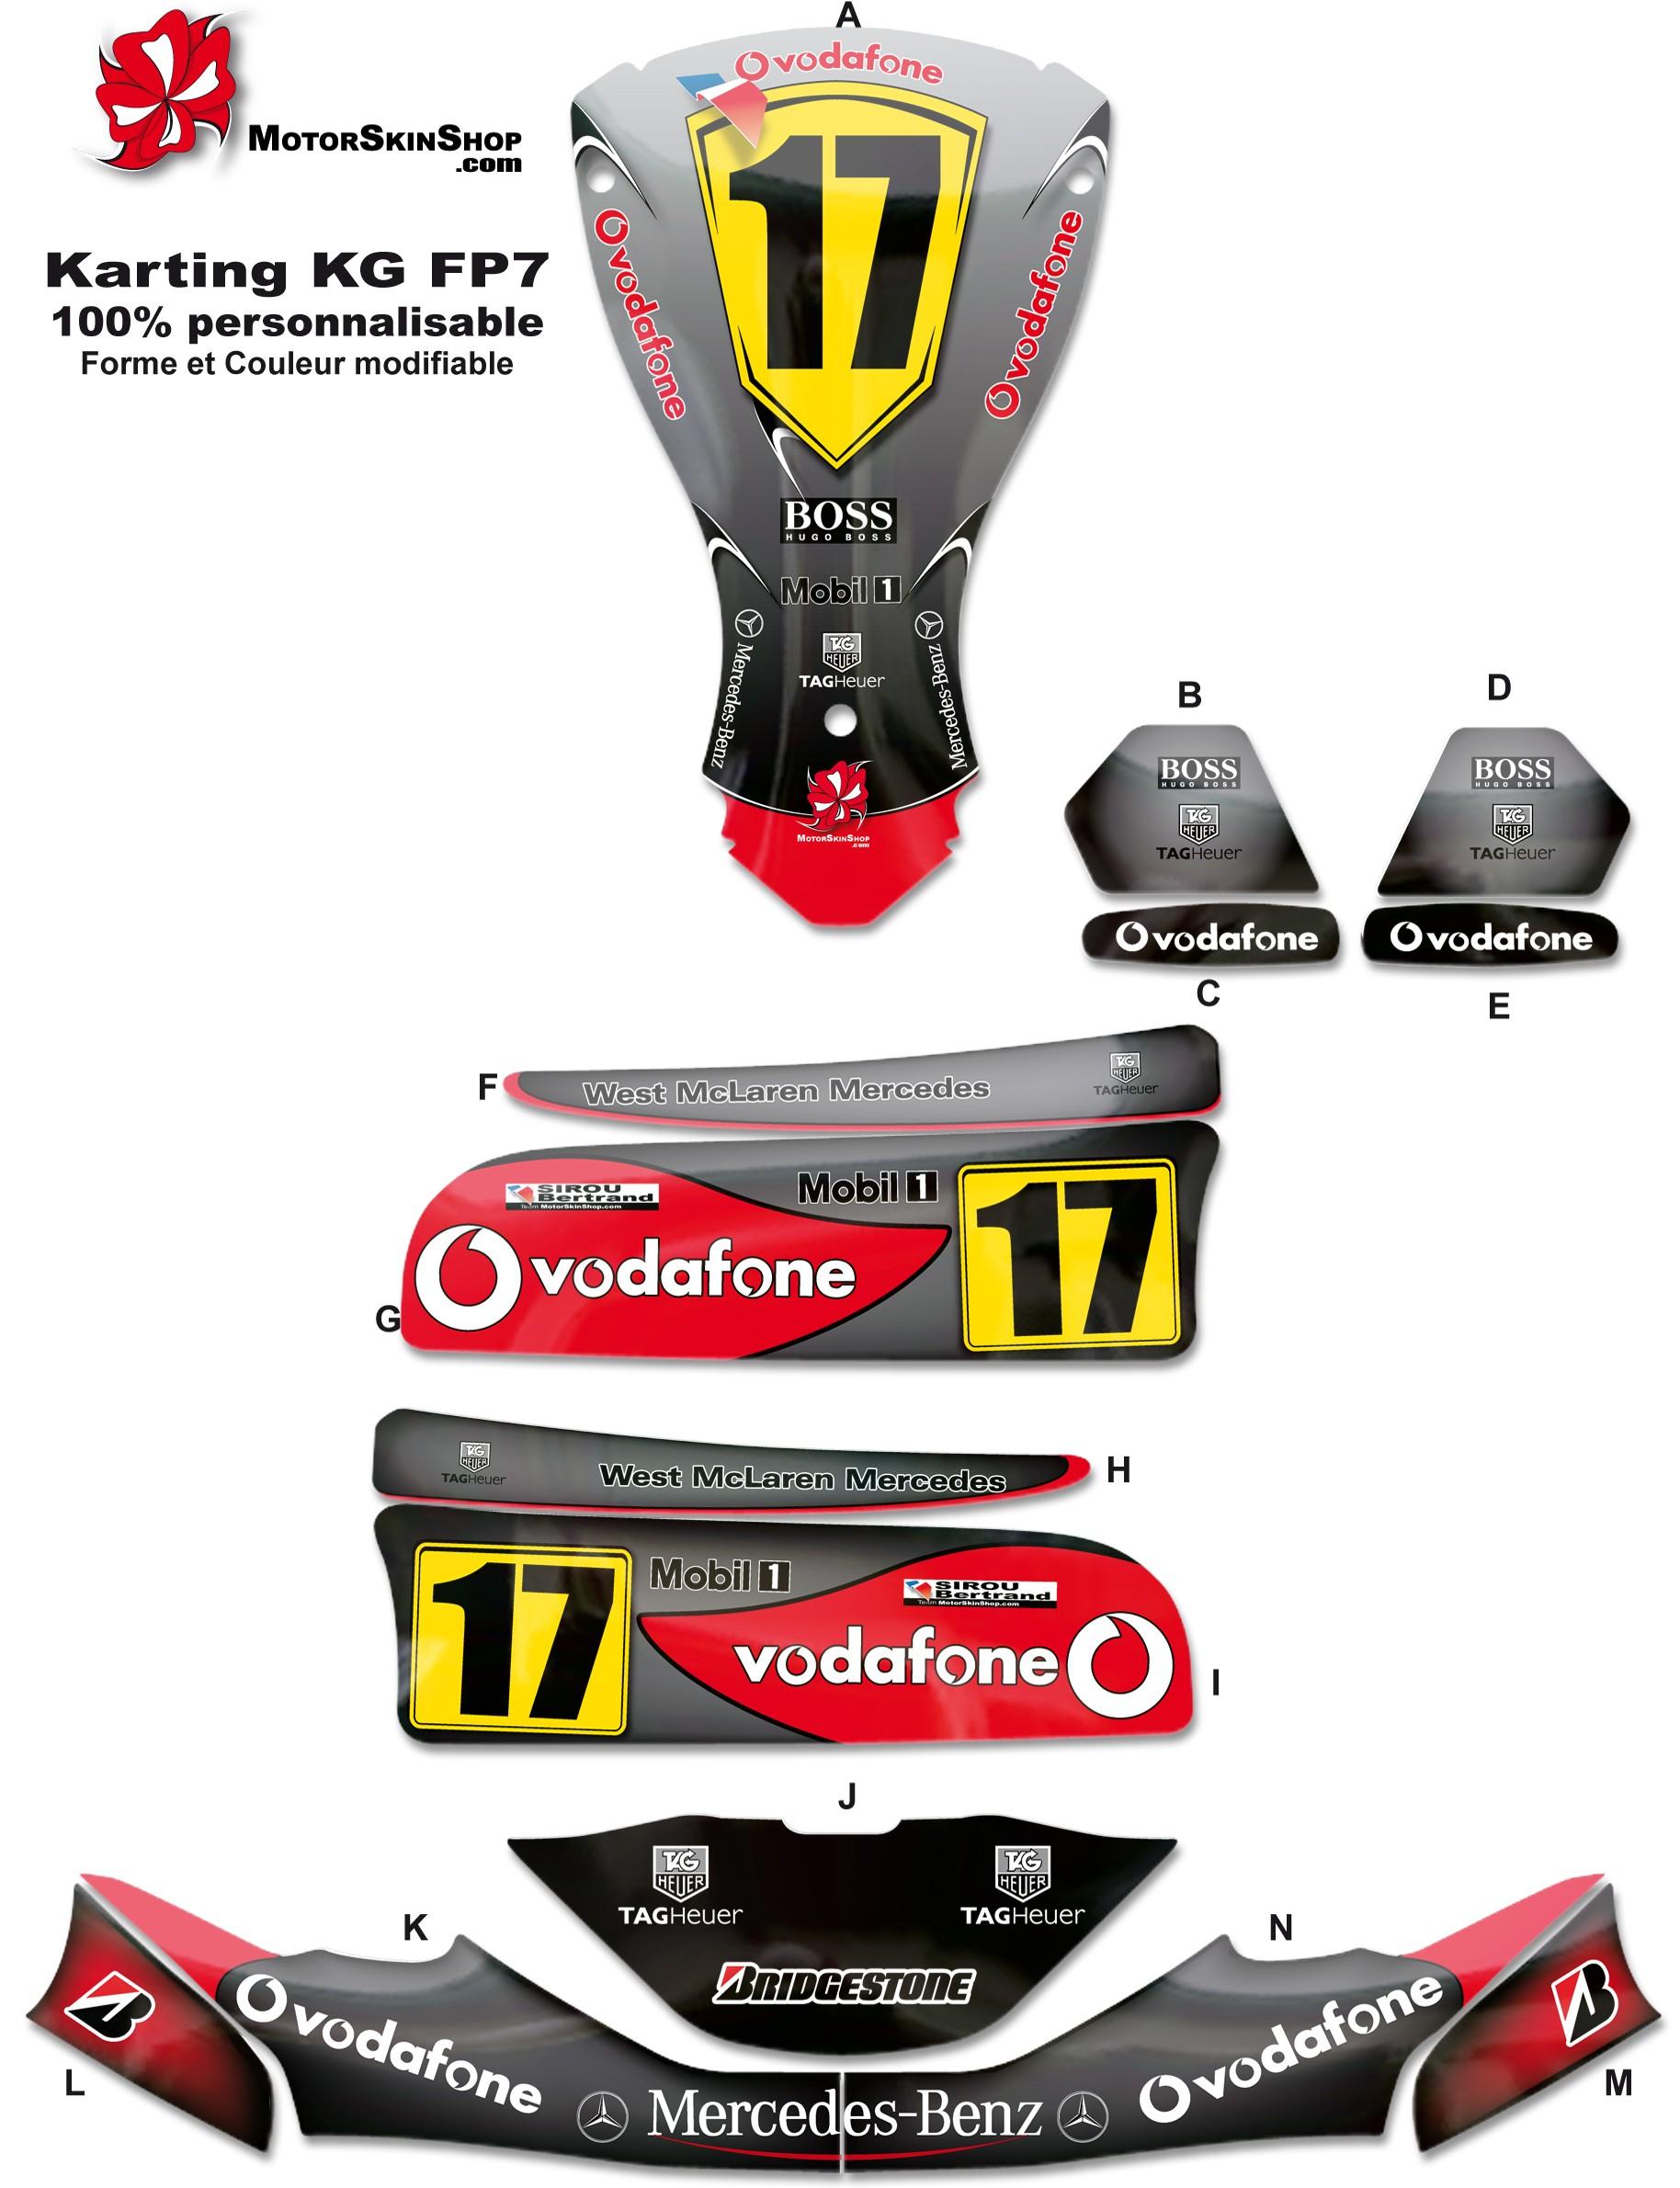 Kit déco Karting KG FP7 Mc Laren F1